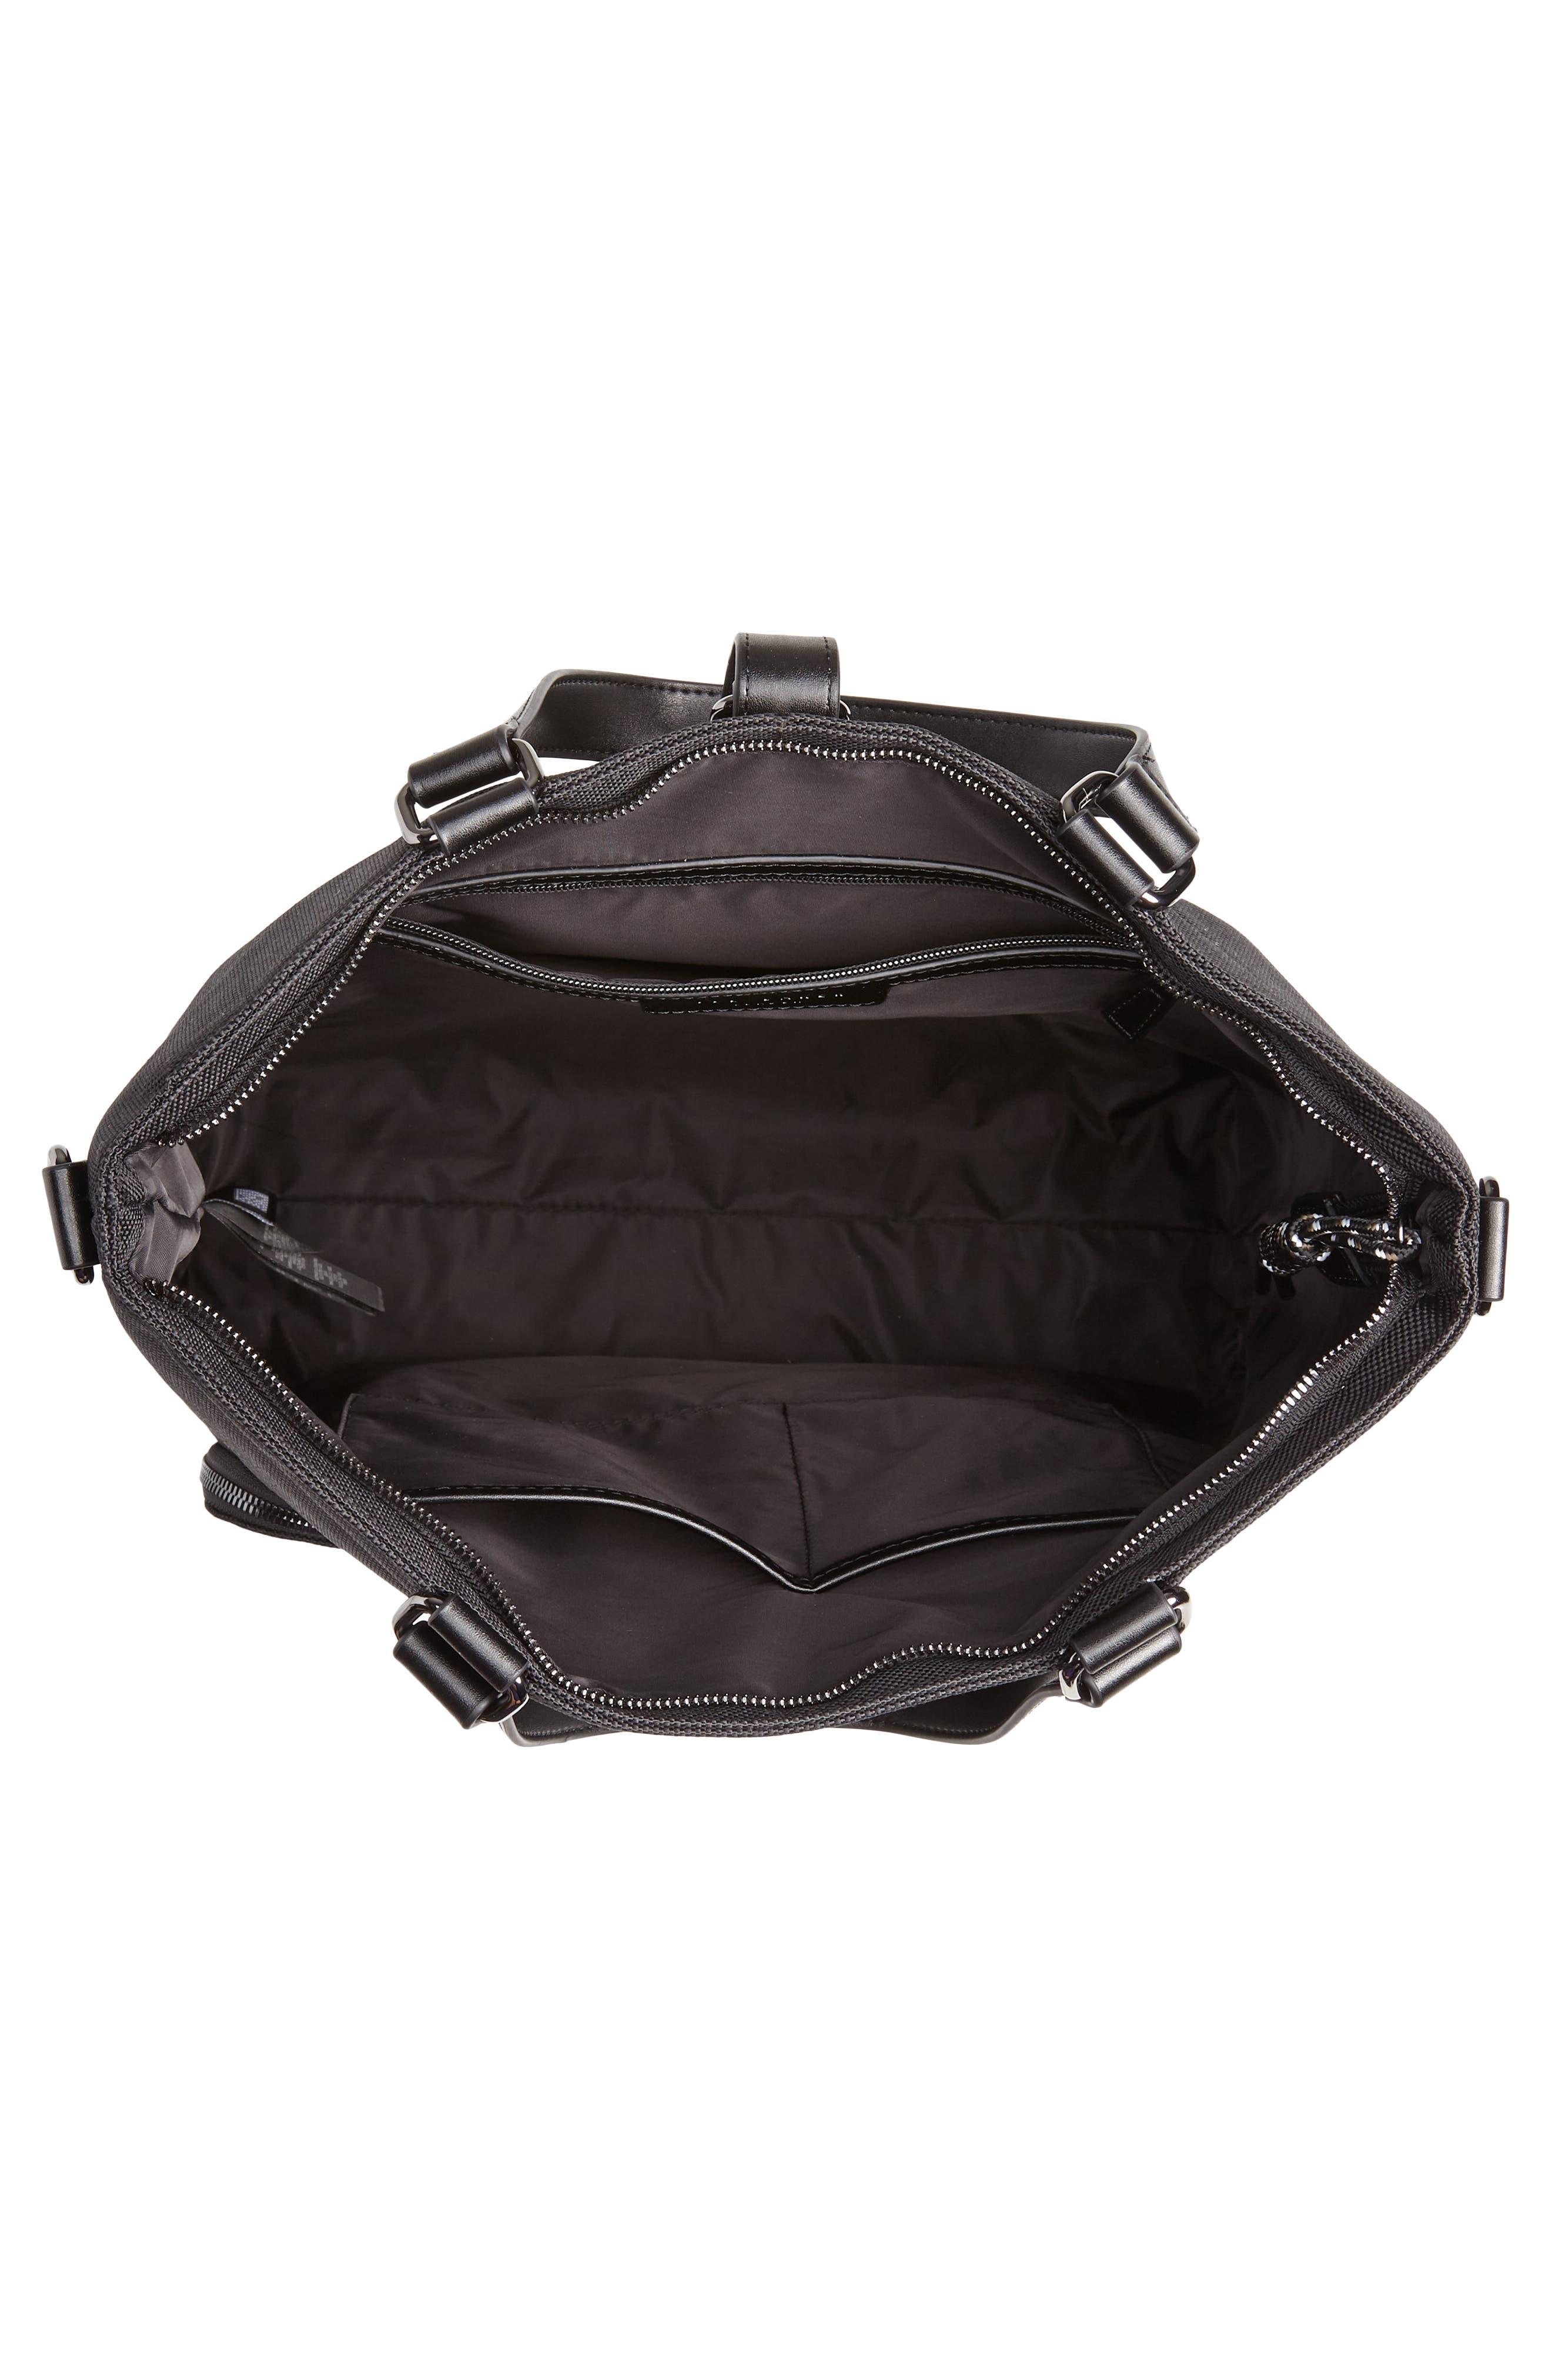 Tidee Convertible Backpack,                             Alternate thumbnail 4, color,                             BLACK